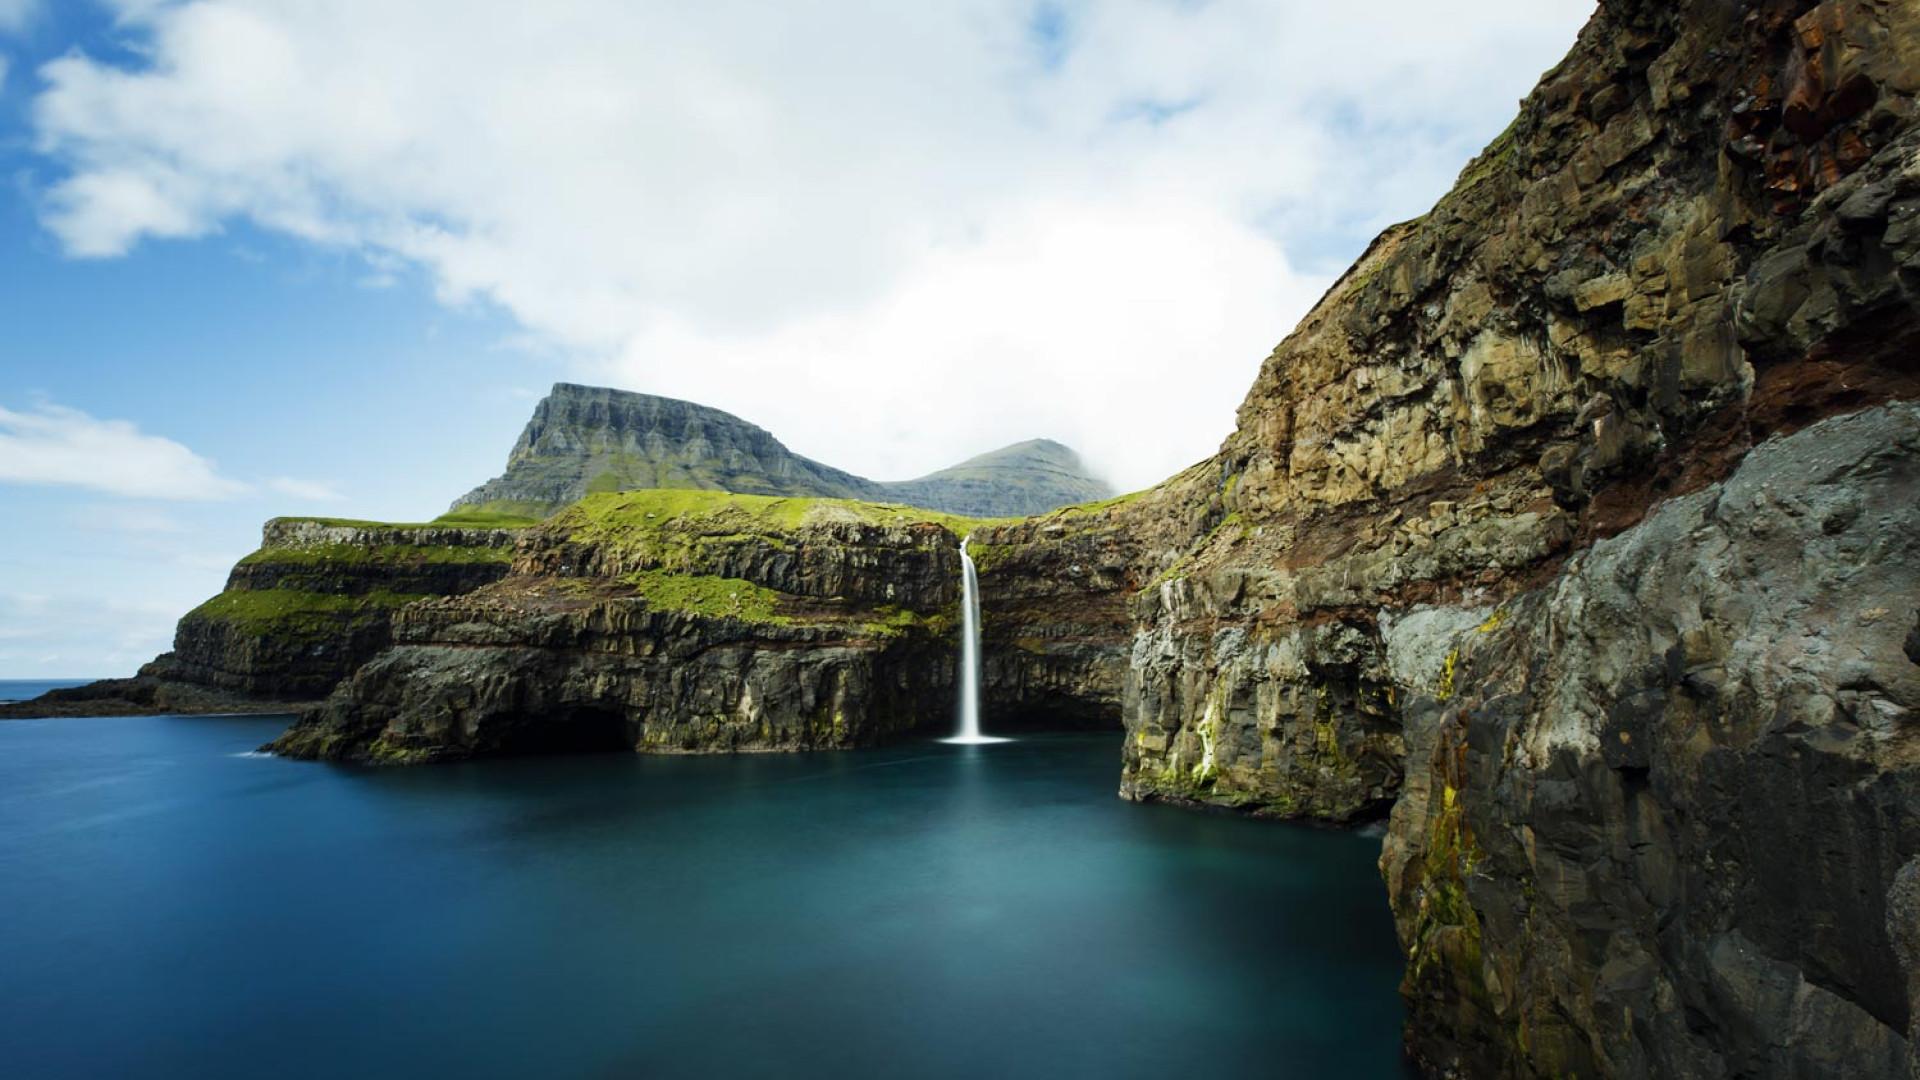 The Mulafossur waterfall, Faroe Islands